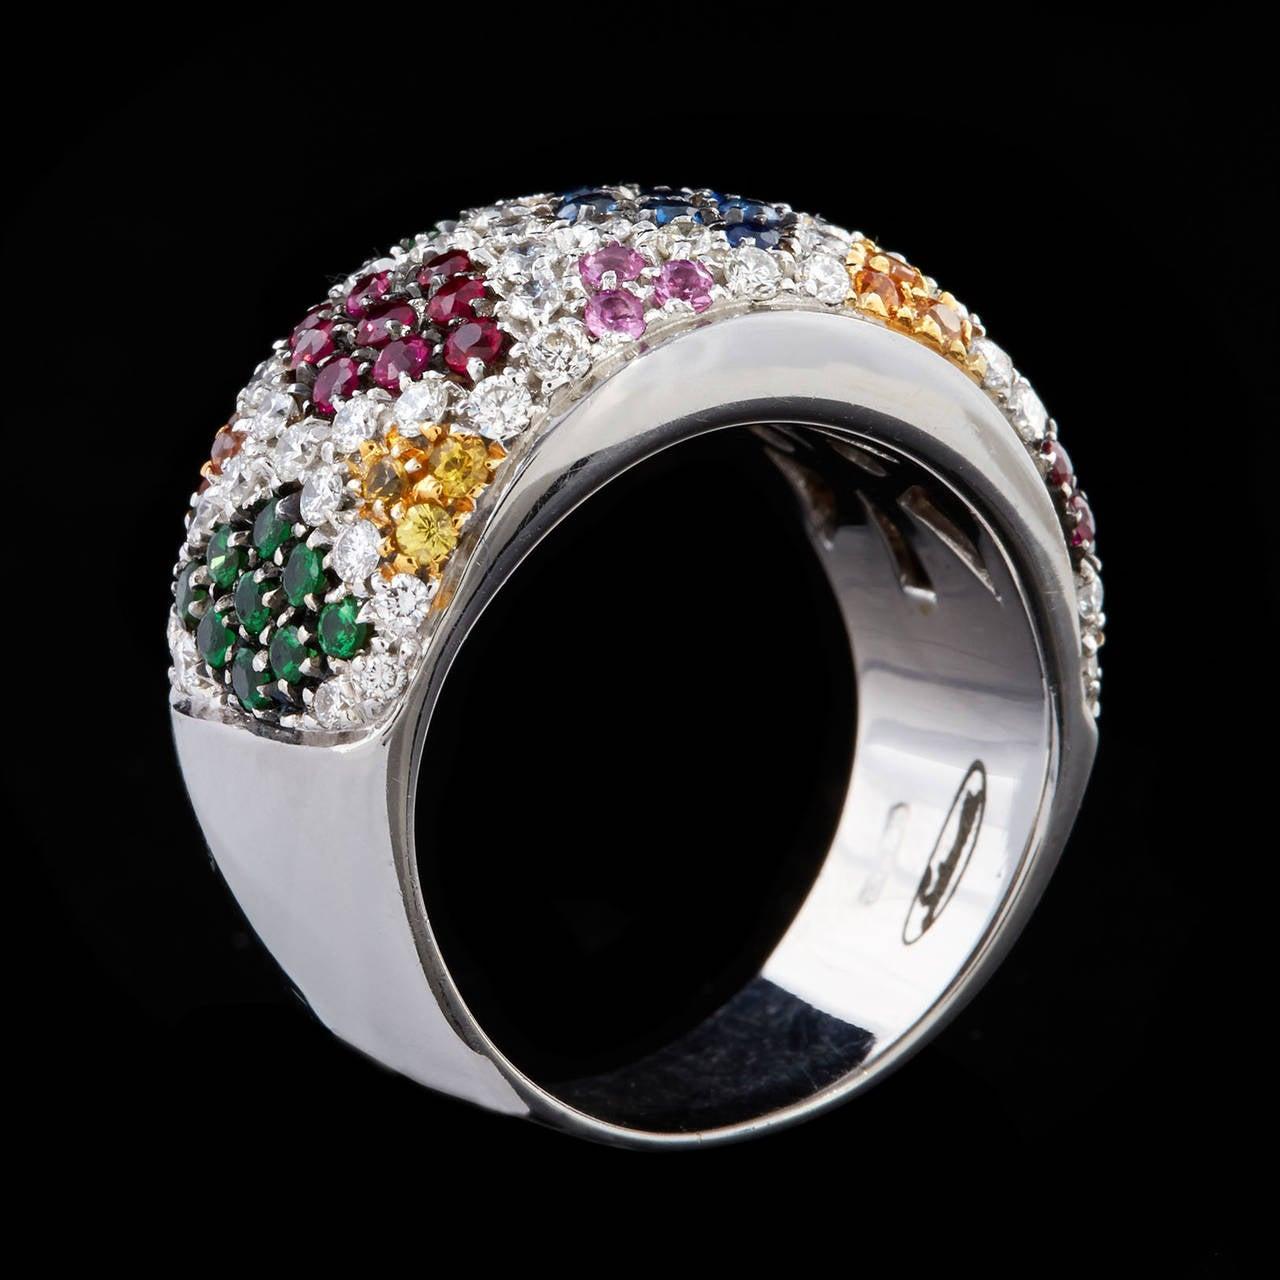 Salavetti Multi-Colored Pave Gemstone Diamond Ring At 1stdibs